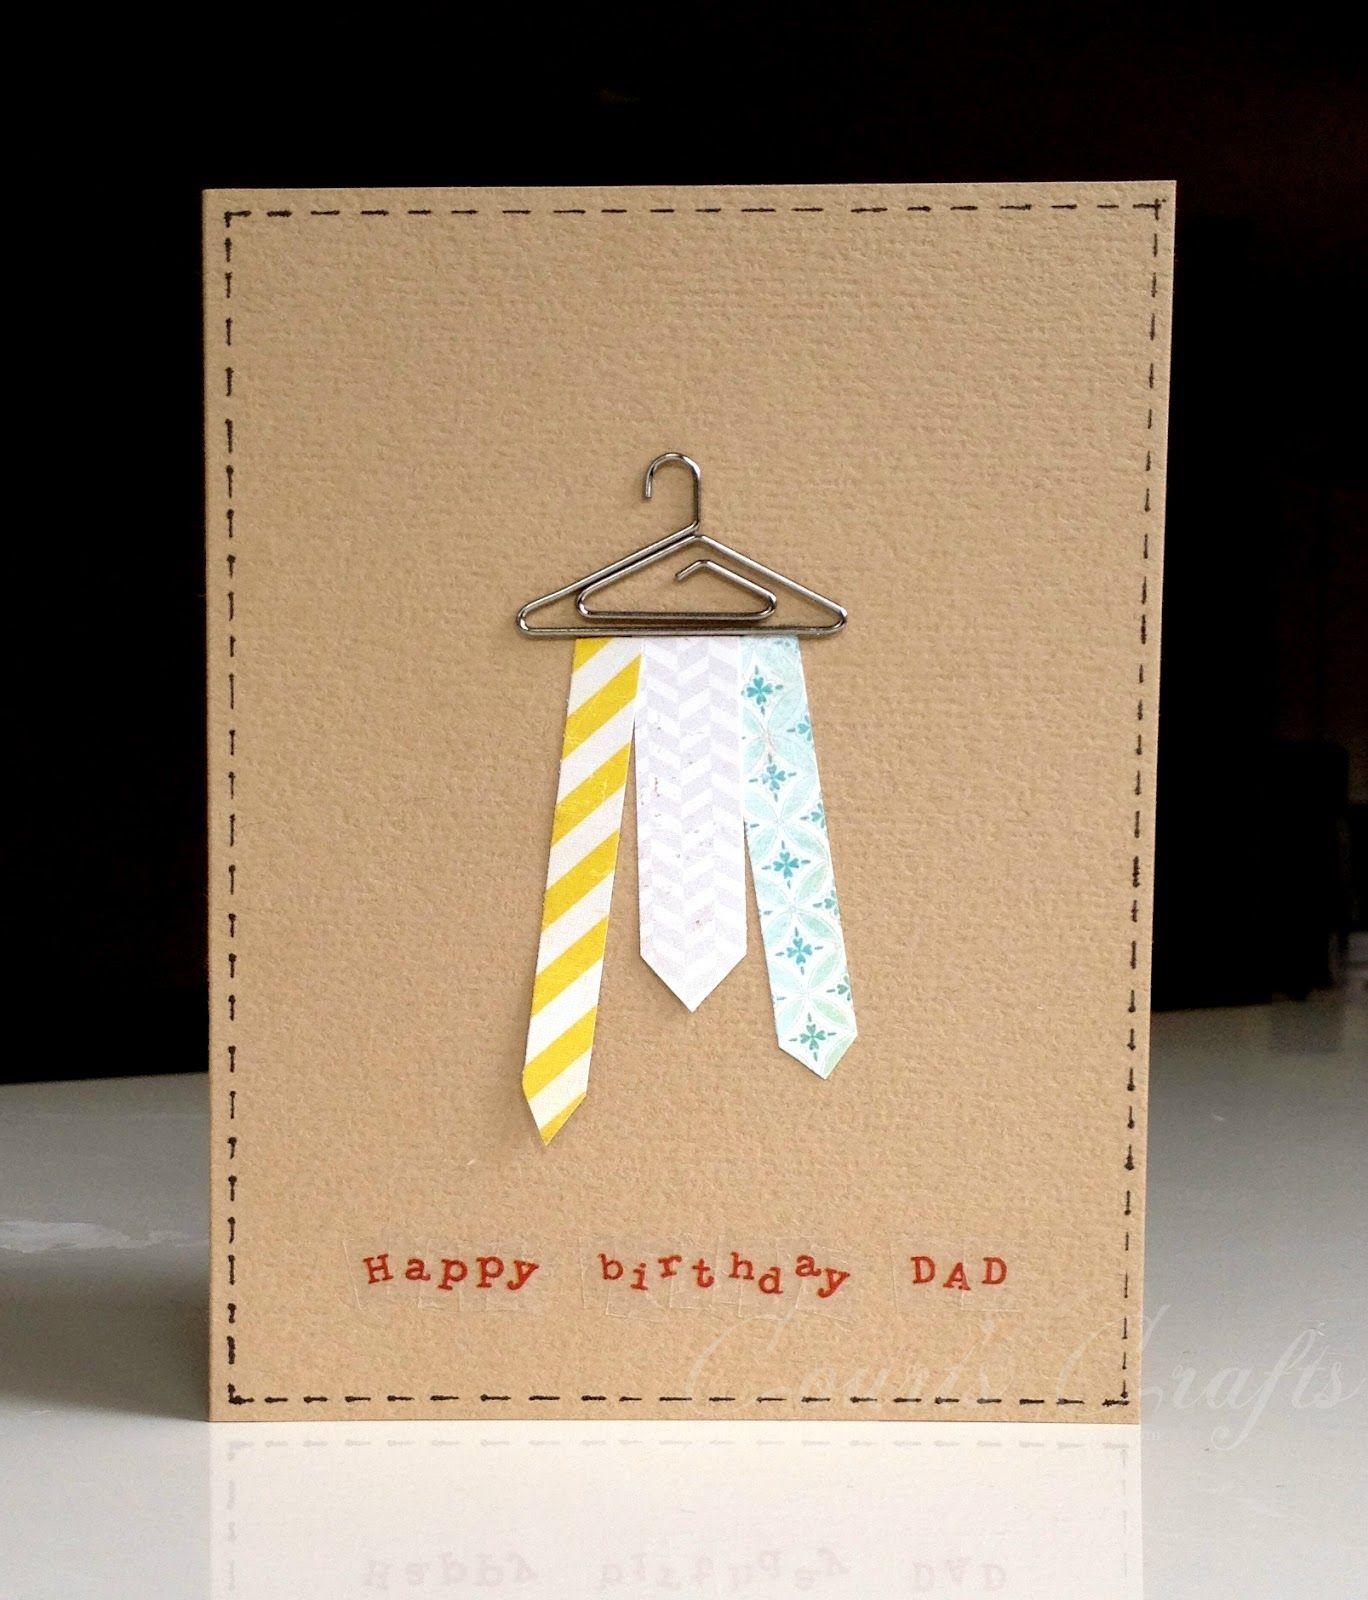 Pumpkin Spice Happy birthday dad! Dad birthday card